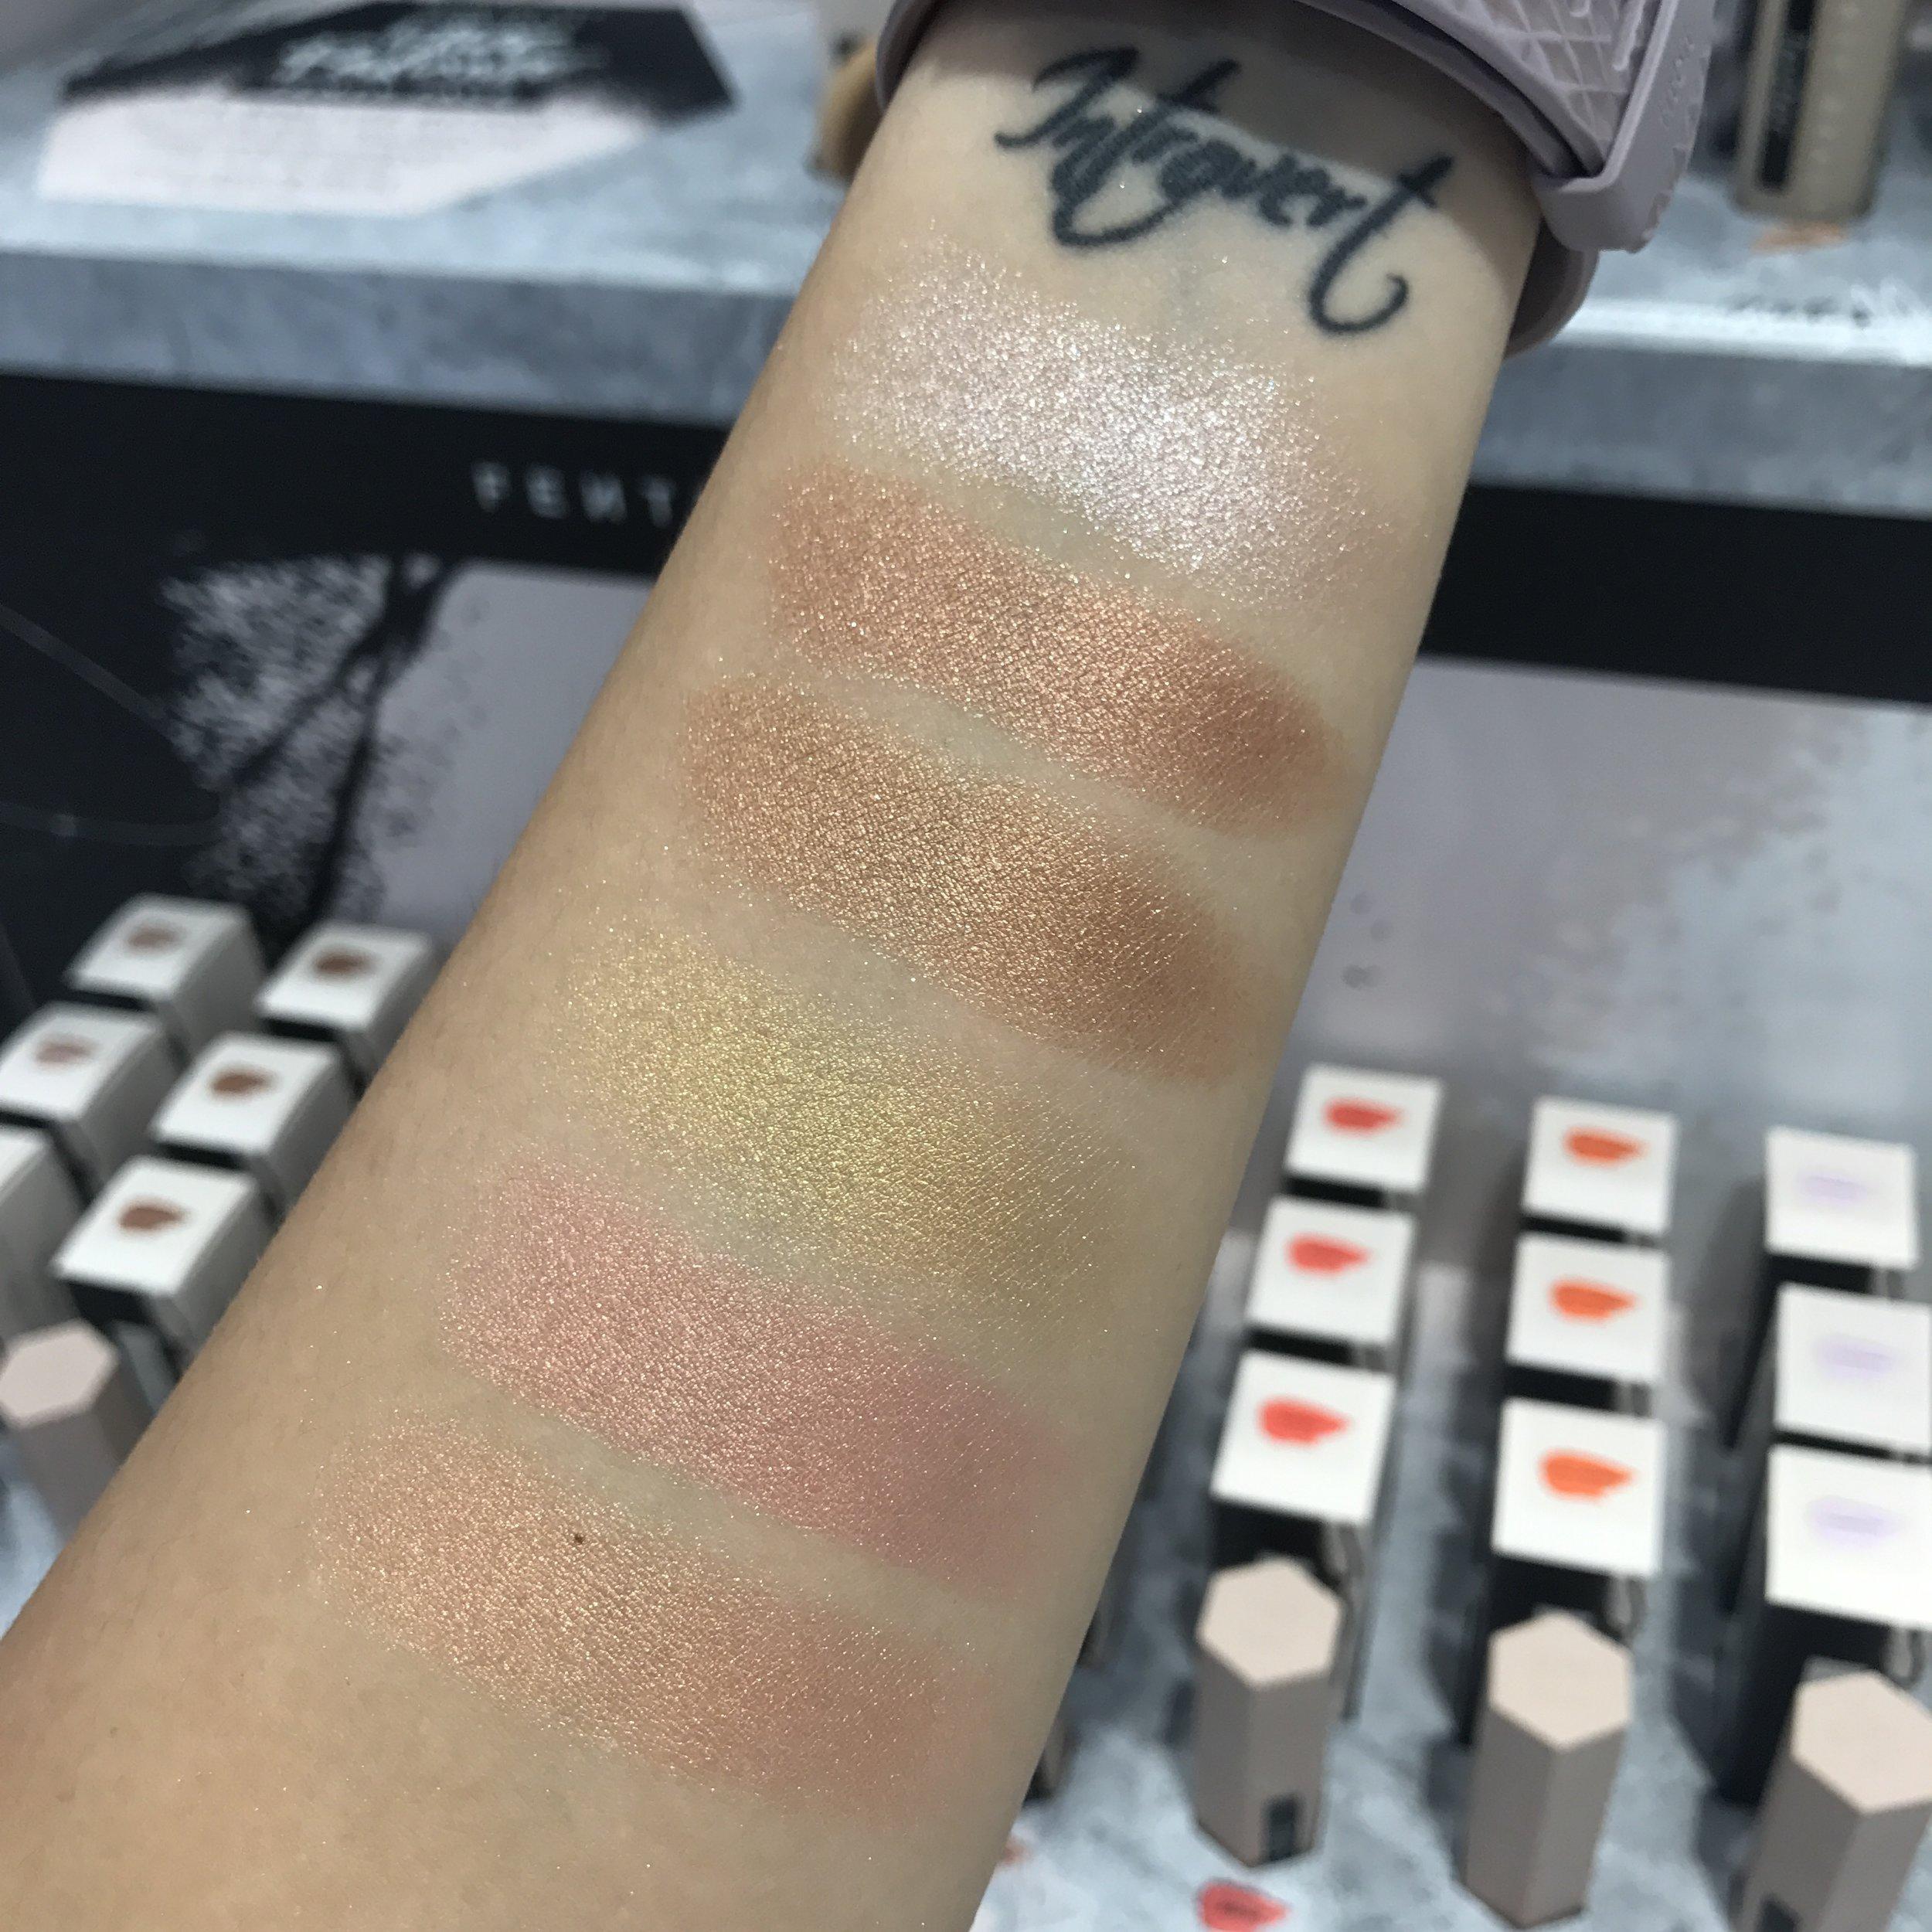 Fenty Beauty Shimmer Matchstix swatches